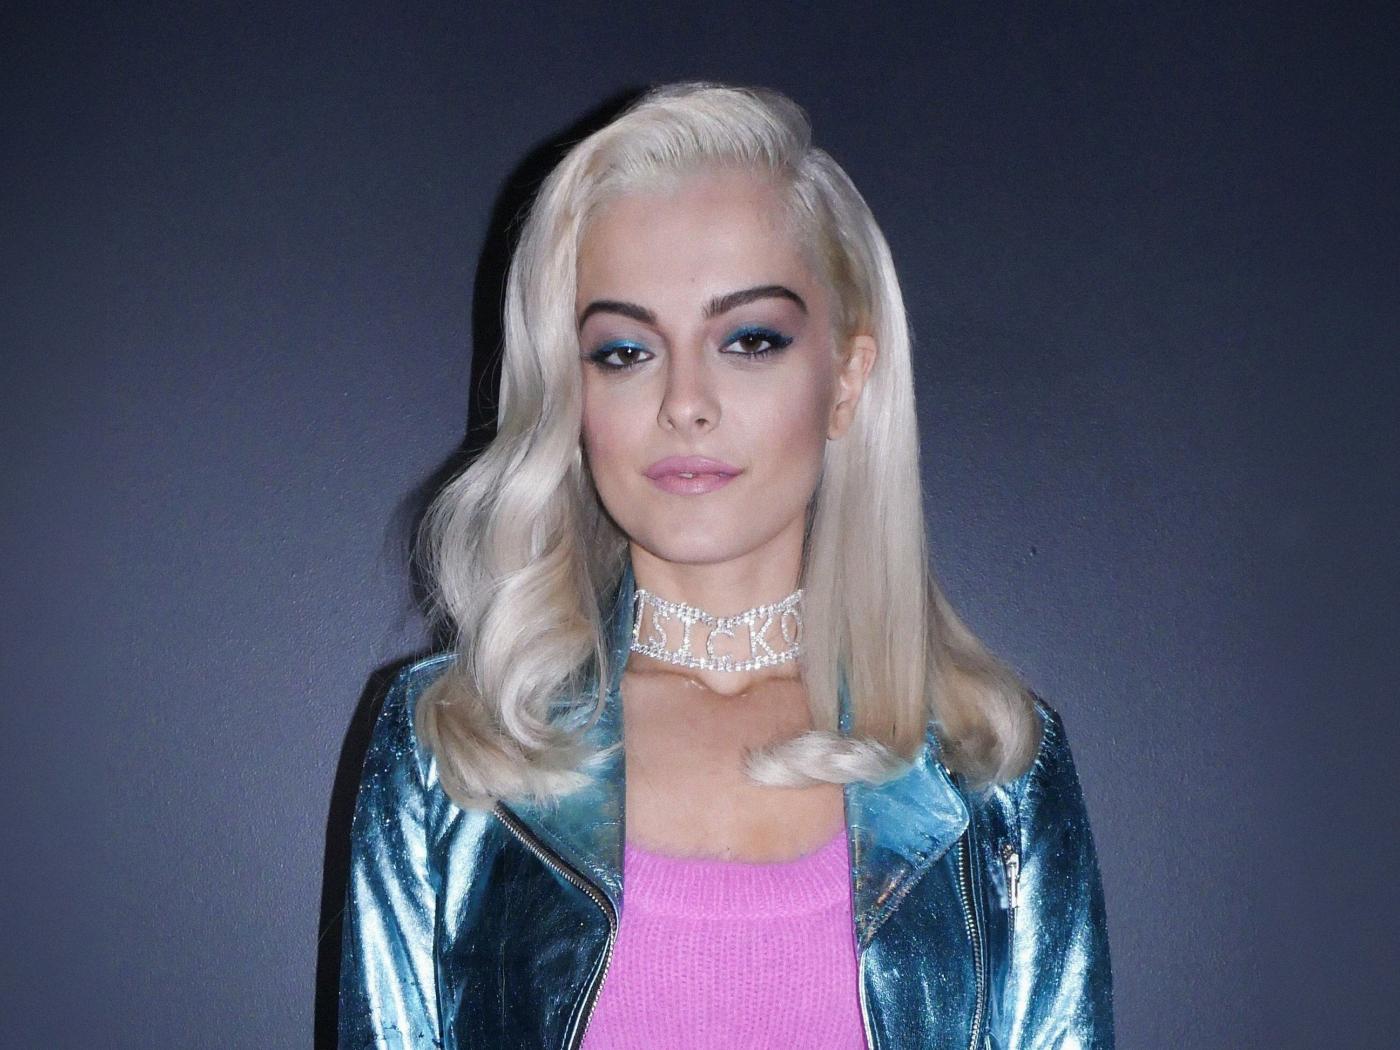 Download 1400x1050 Wallpaper Bebe Rexha Shining Jacket